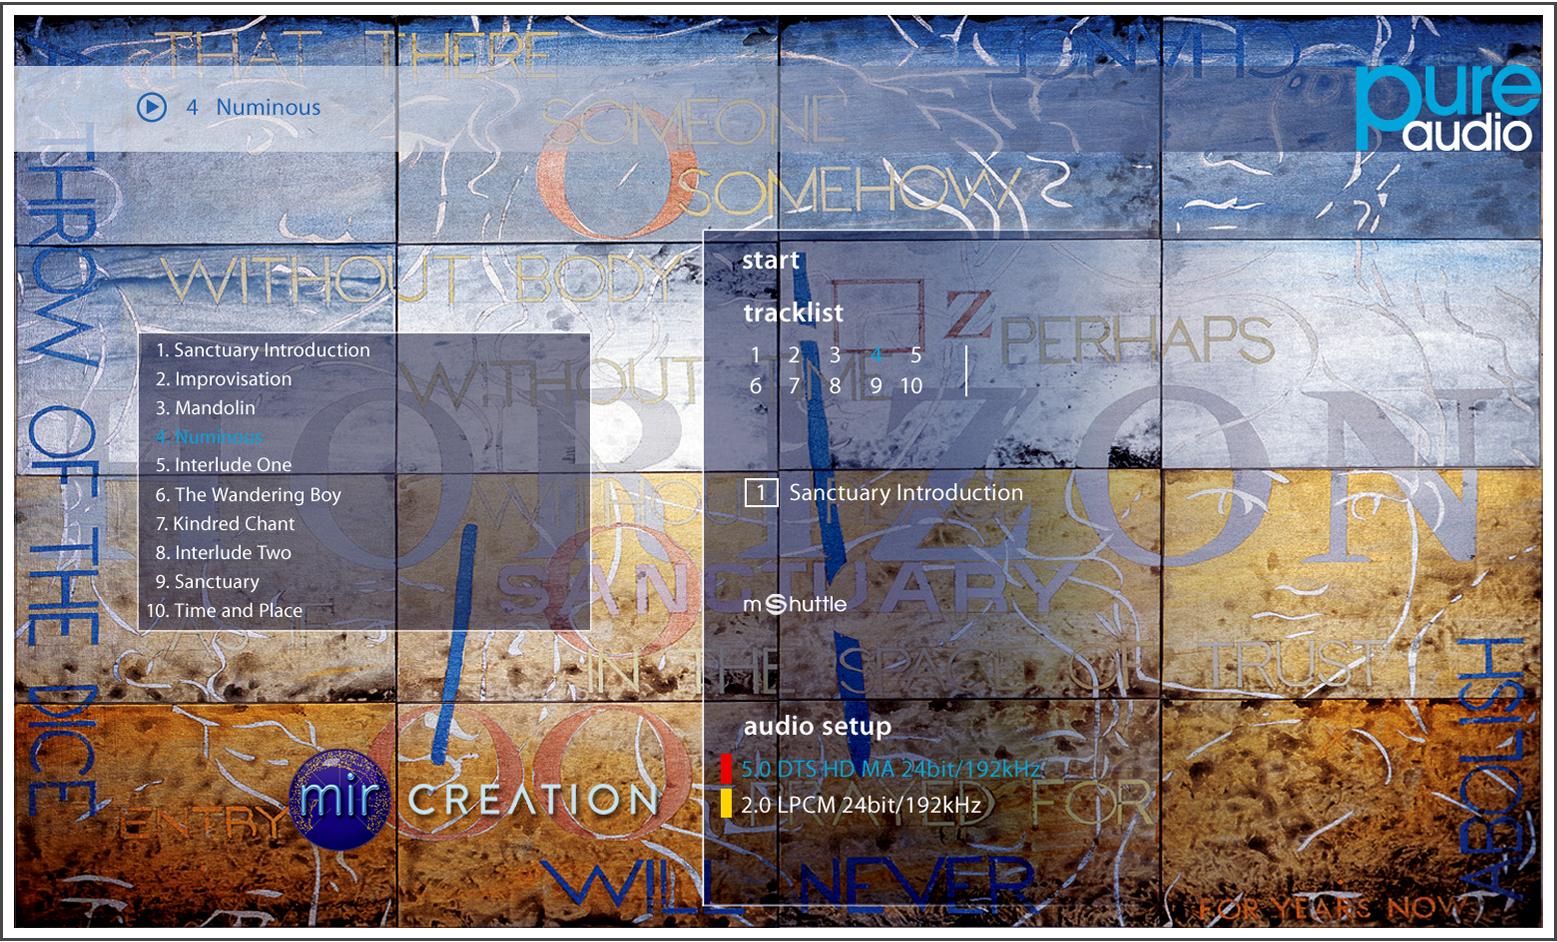 PABD-Sanctuary_v3.300dpi.5.flat & cropped & frame